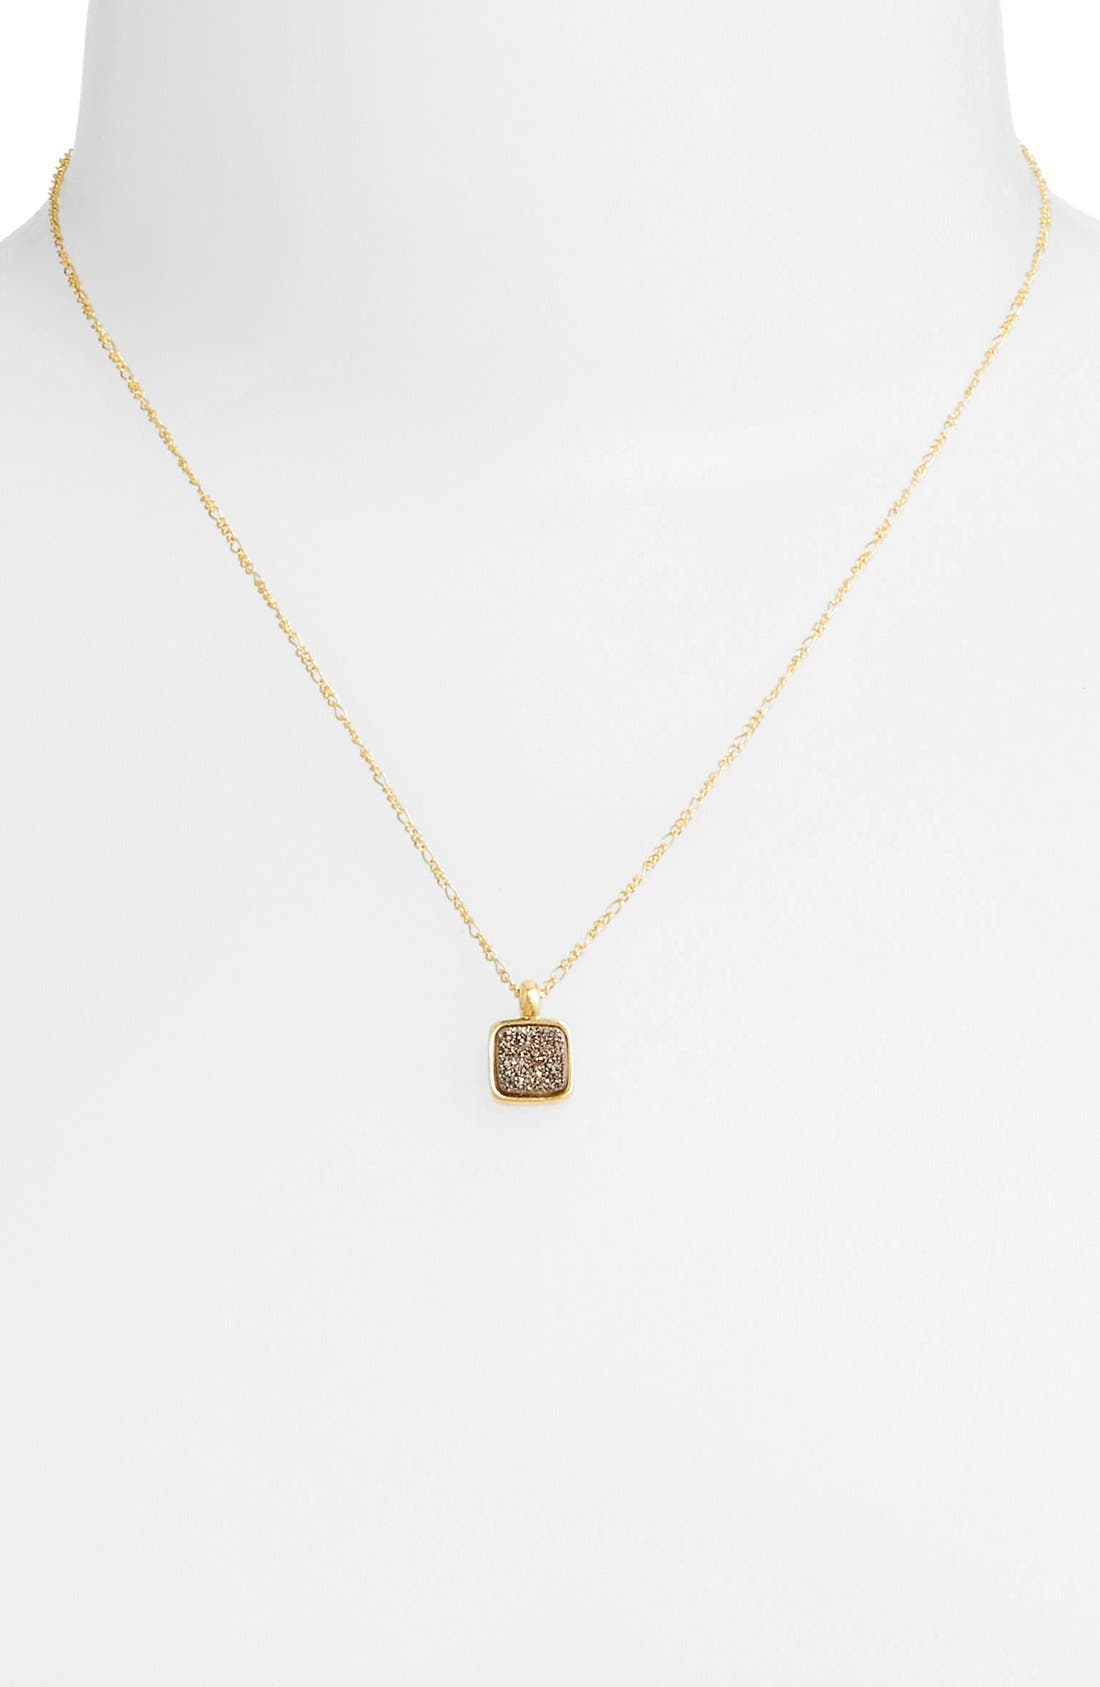 Main Image - Marcia Moran 'Drusy Extravaganza' Pendant Necklace (Online Only)